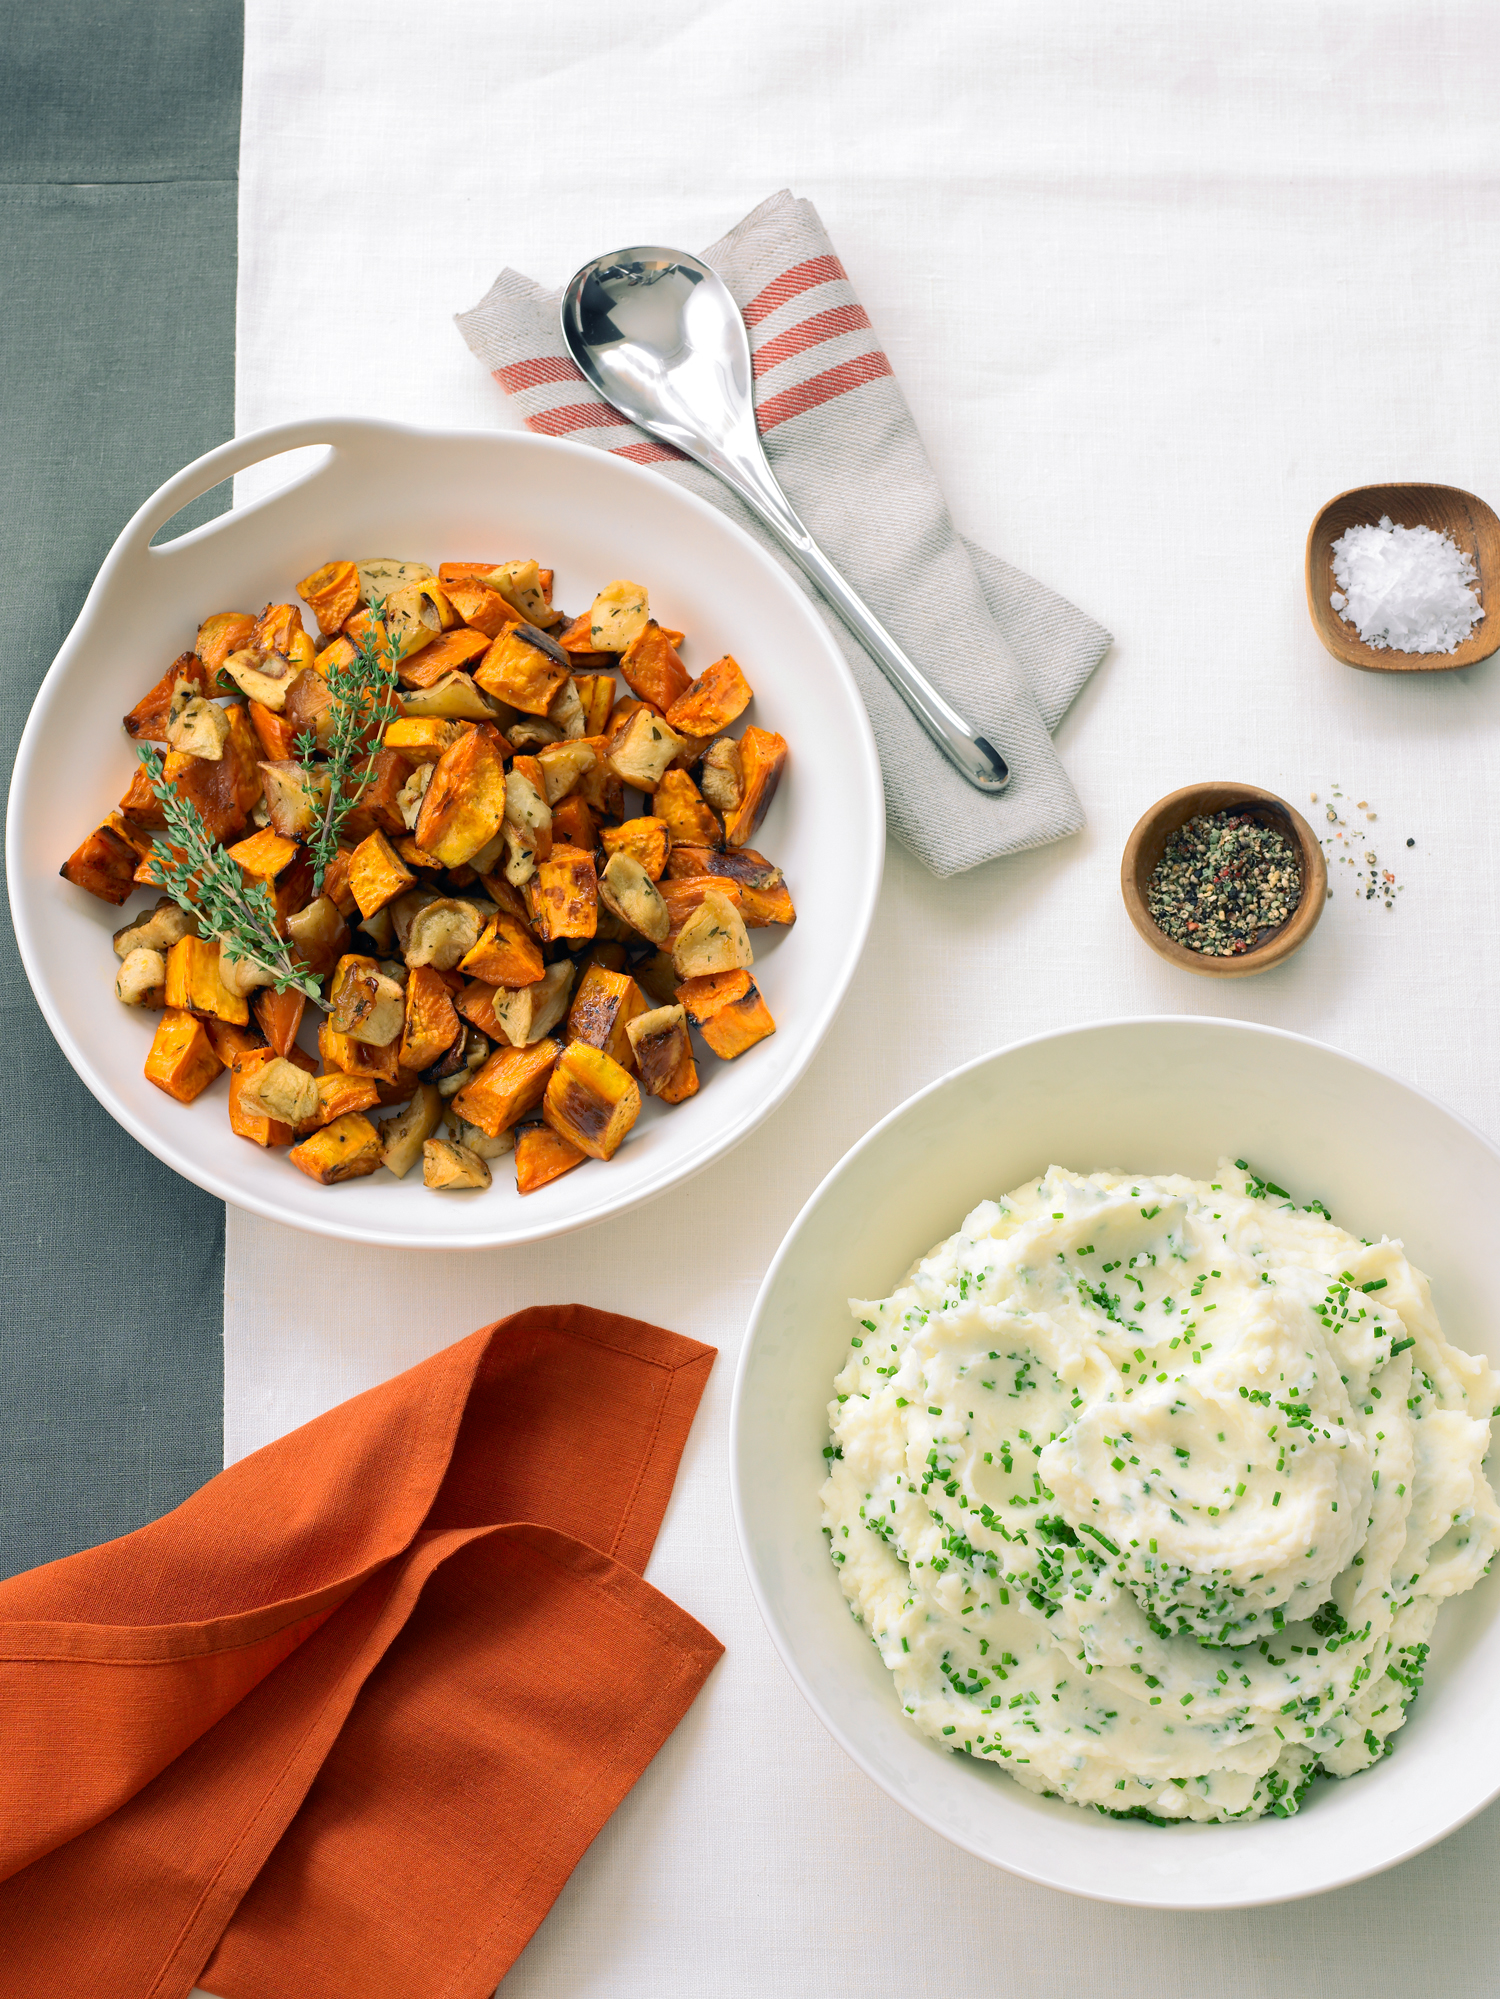 Roasted veg: Roasted Sweet Potatoes and Apples (1013)